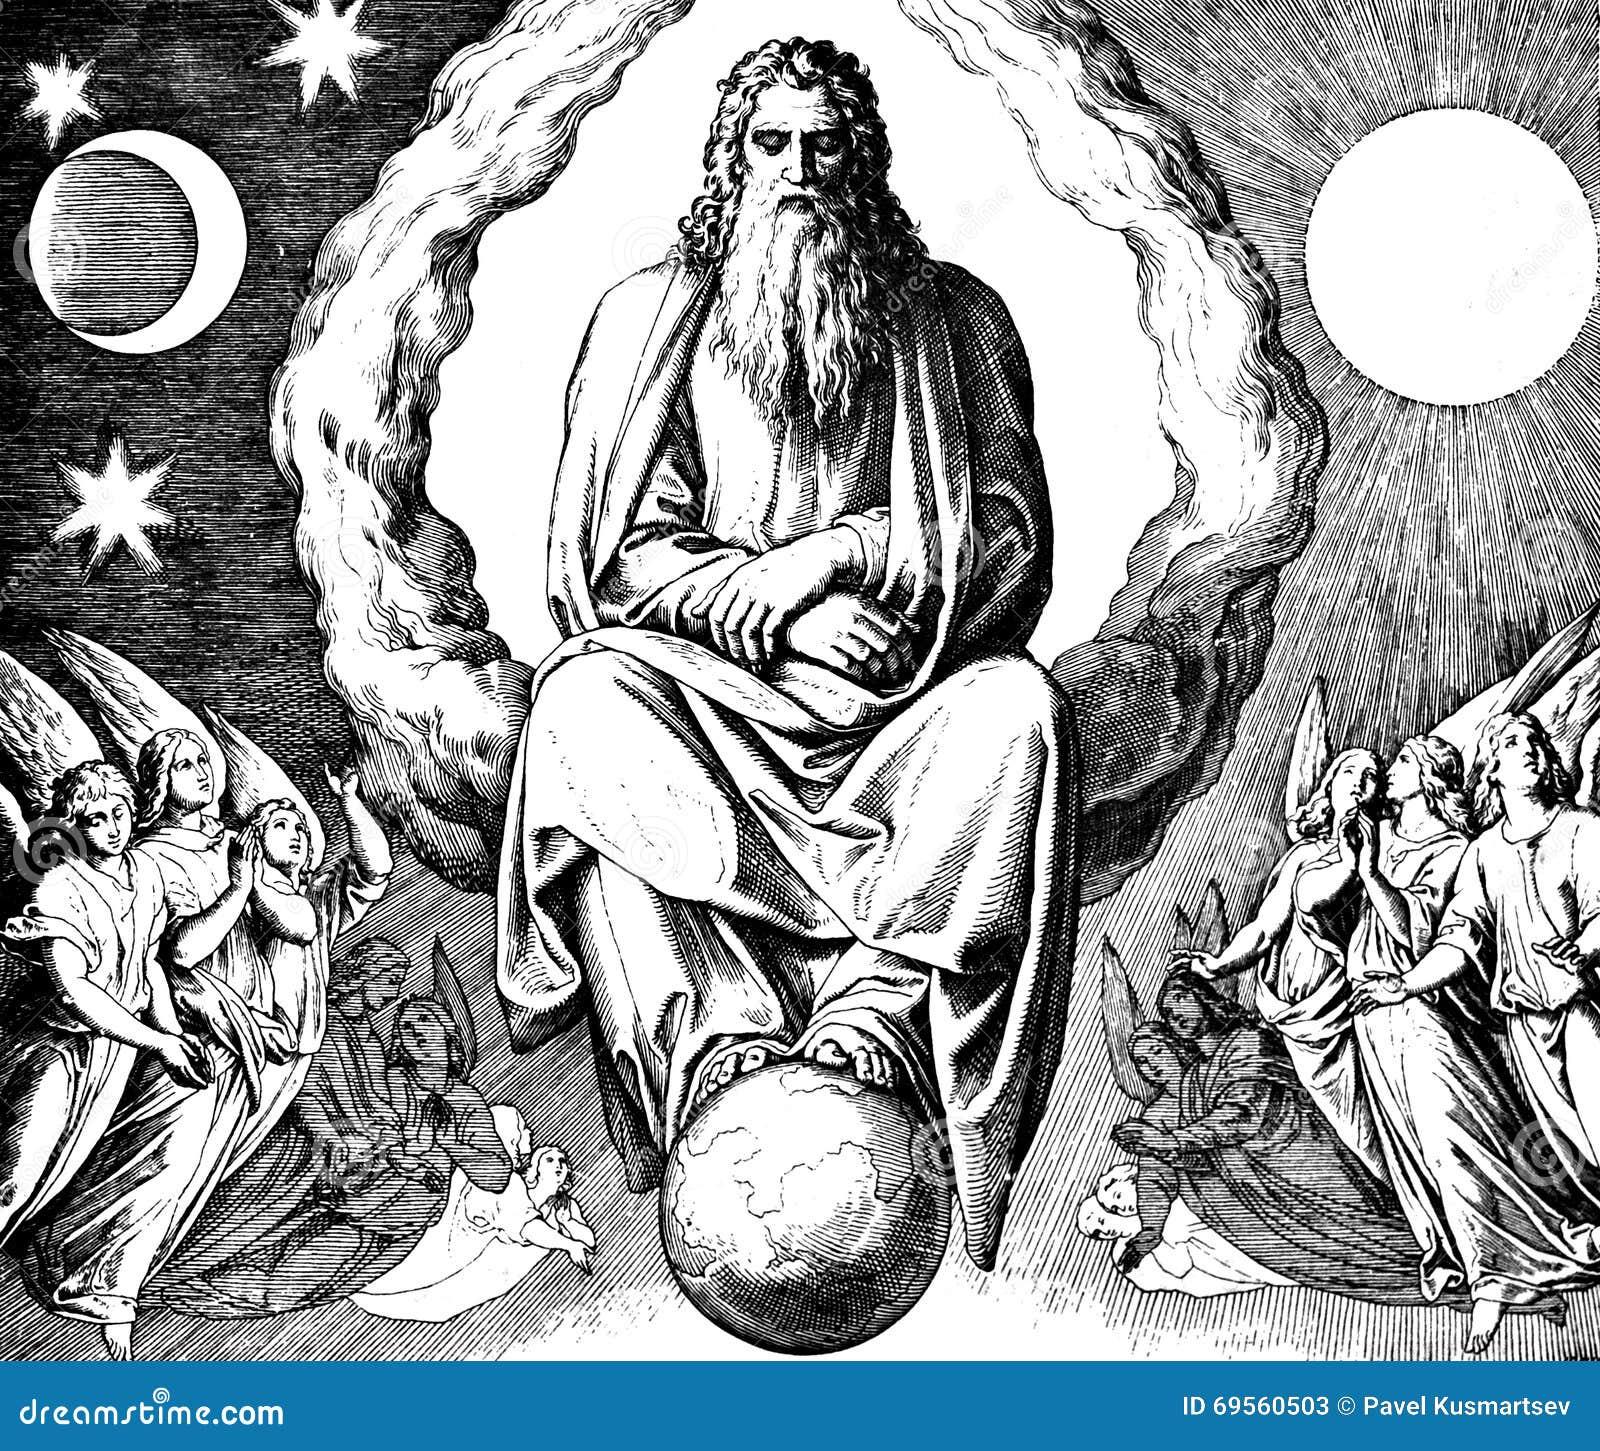 Creation Day 7